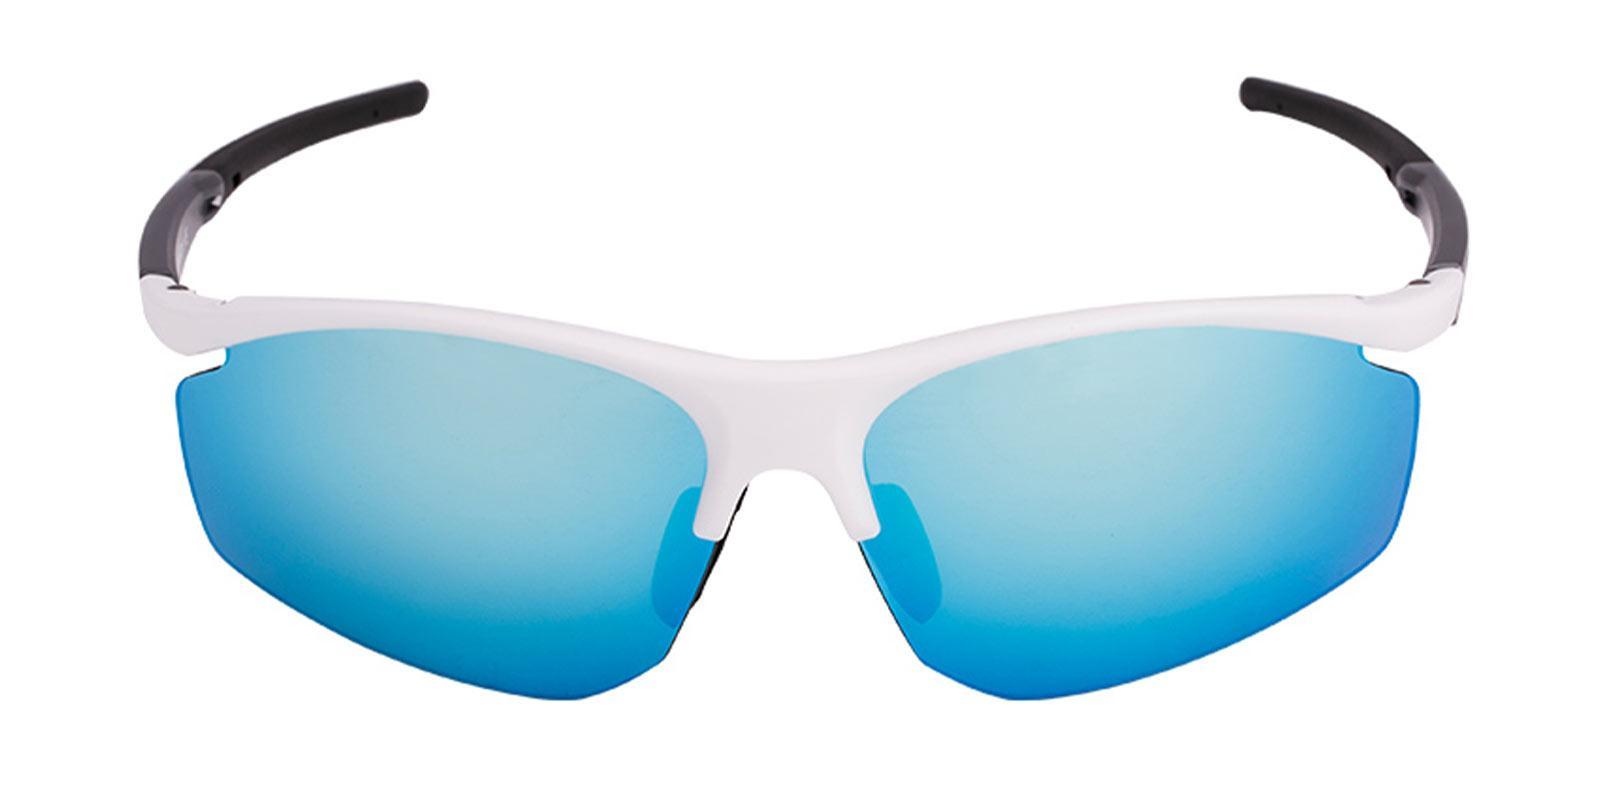 BiddiW-White-Geometric-Combination-SportsGlasses-detail